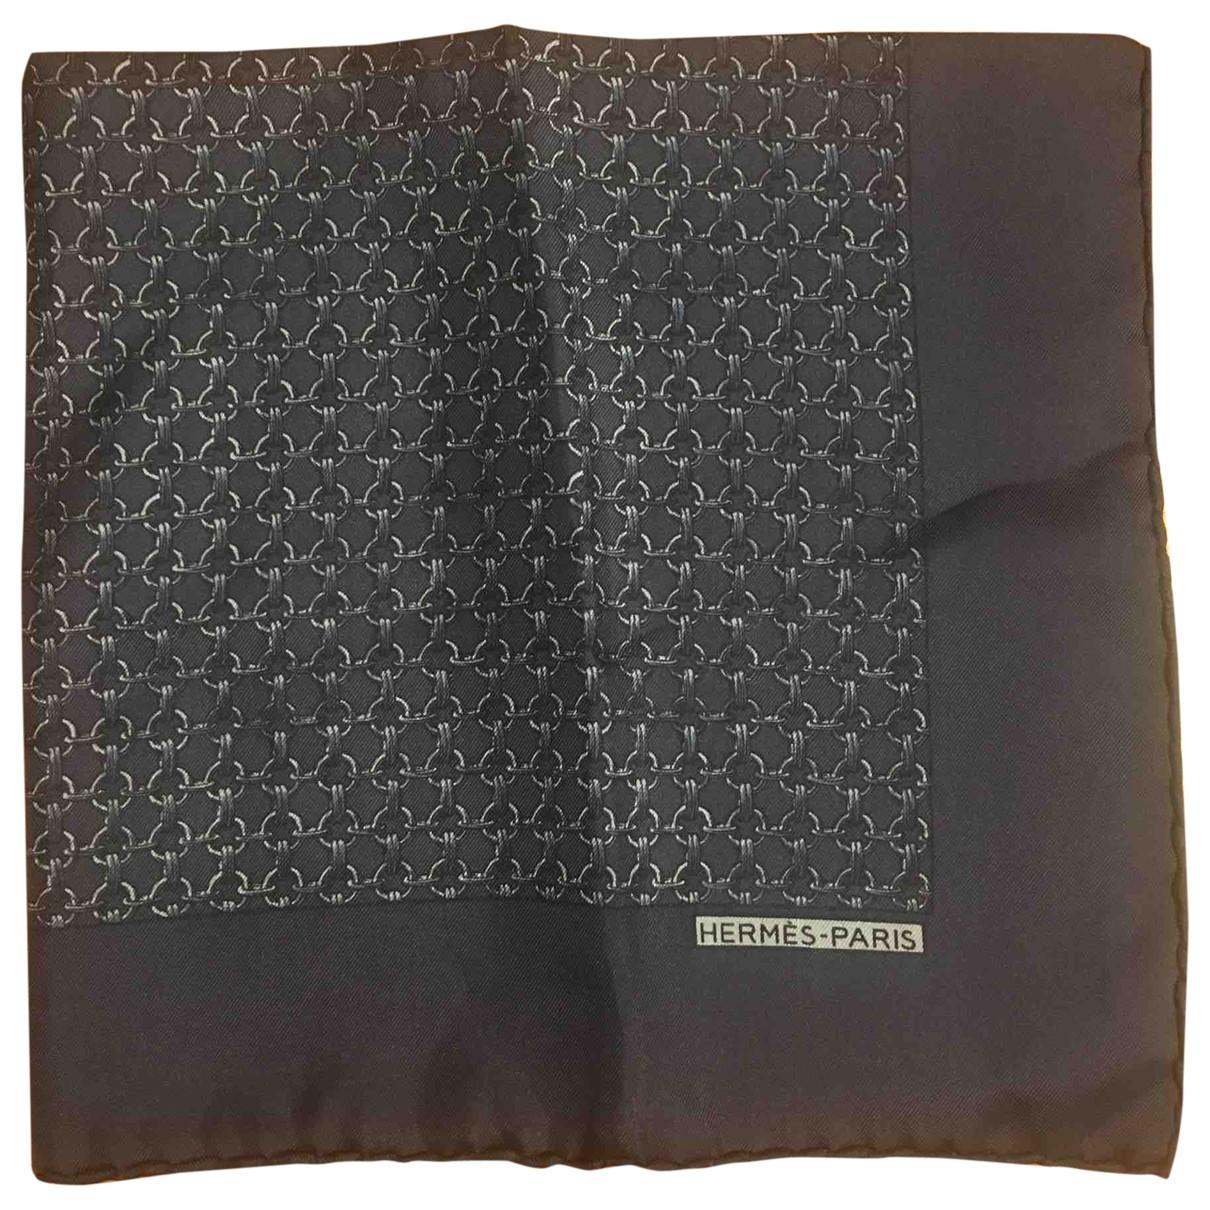 Hermes - Cheches.Echarpes Pochette pour homme en soie - marine